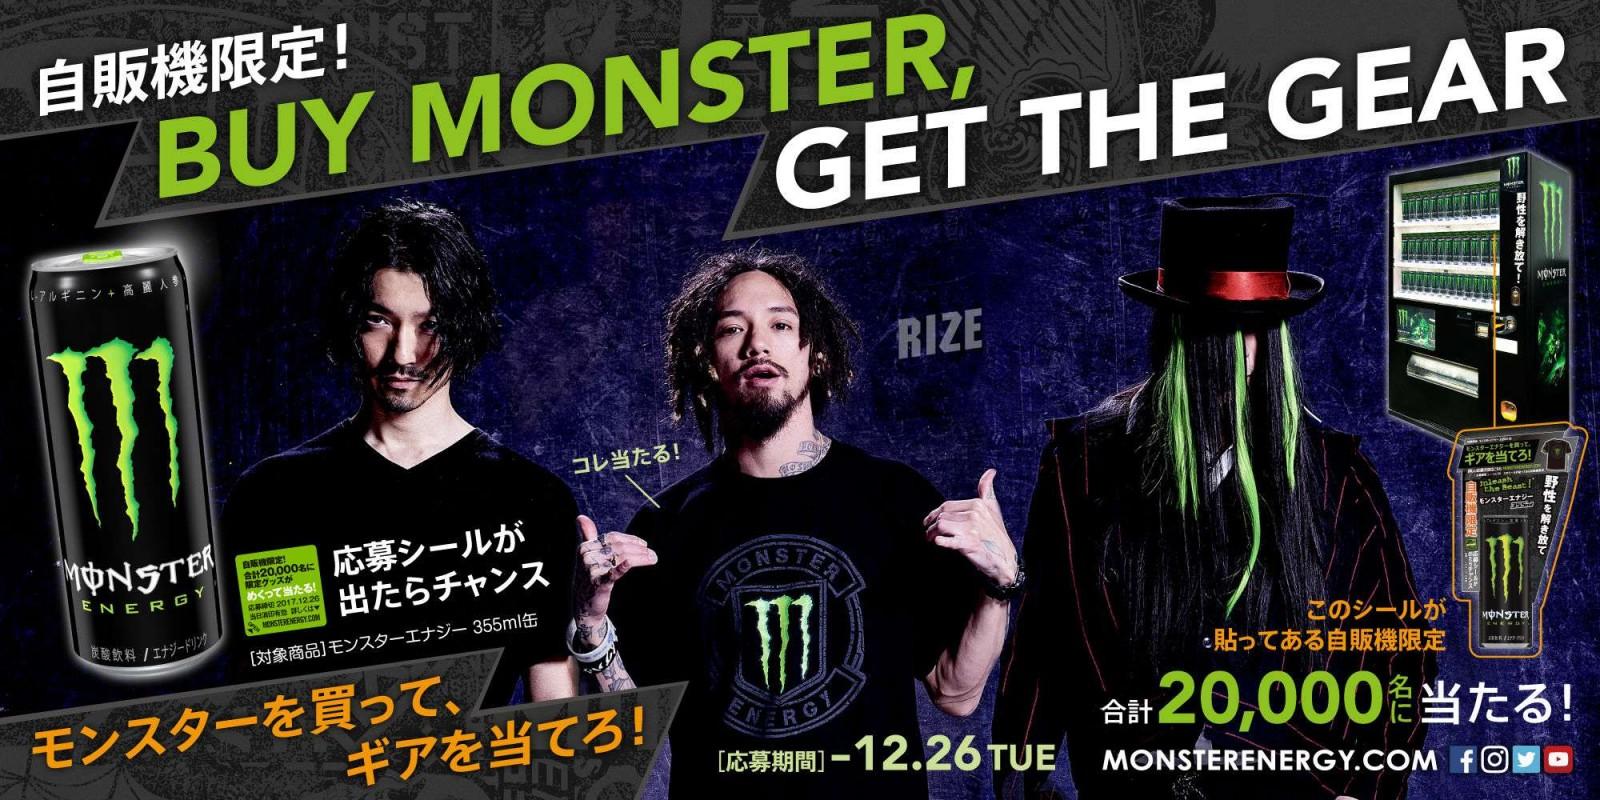 Web graphic for Japan Vending Gear Promotion 2017